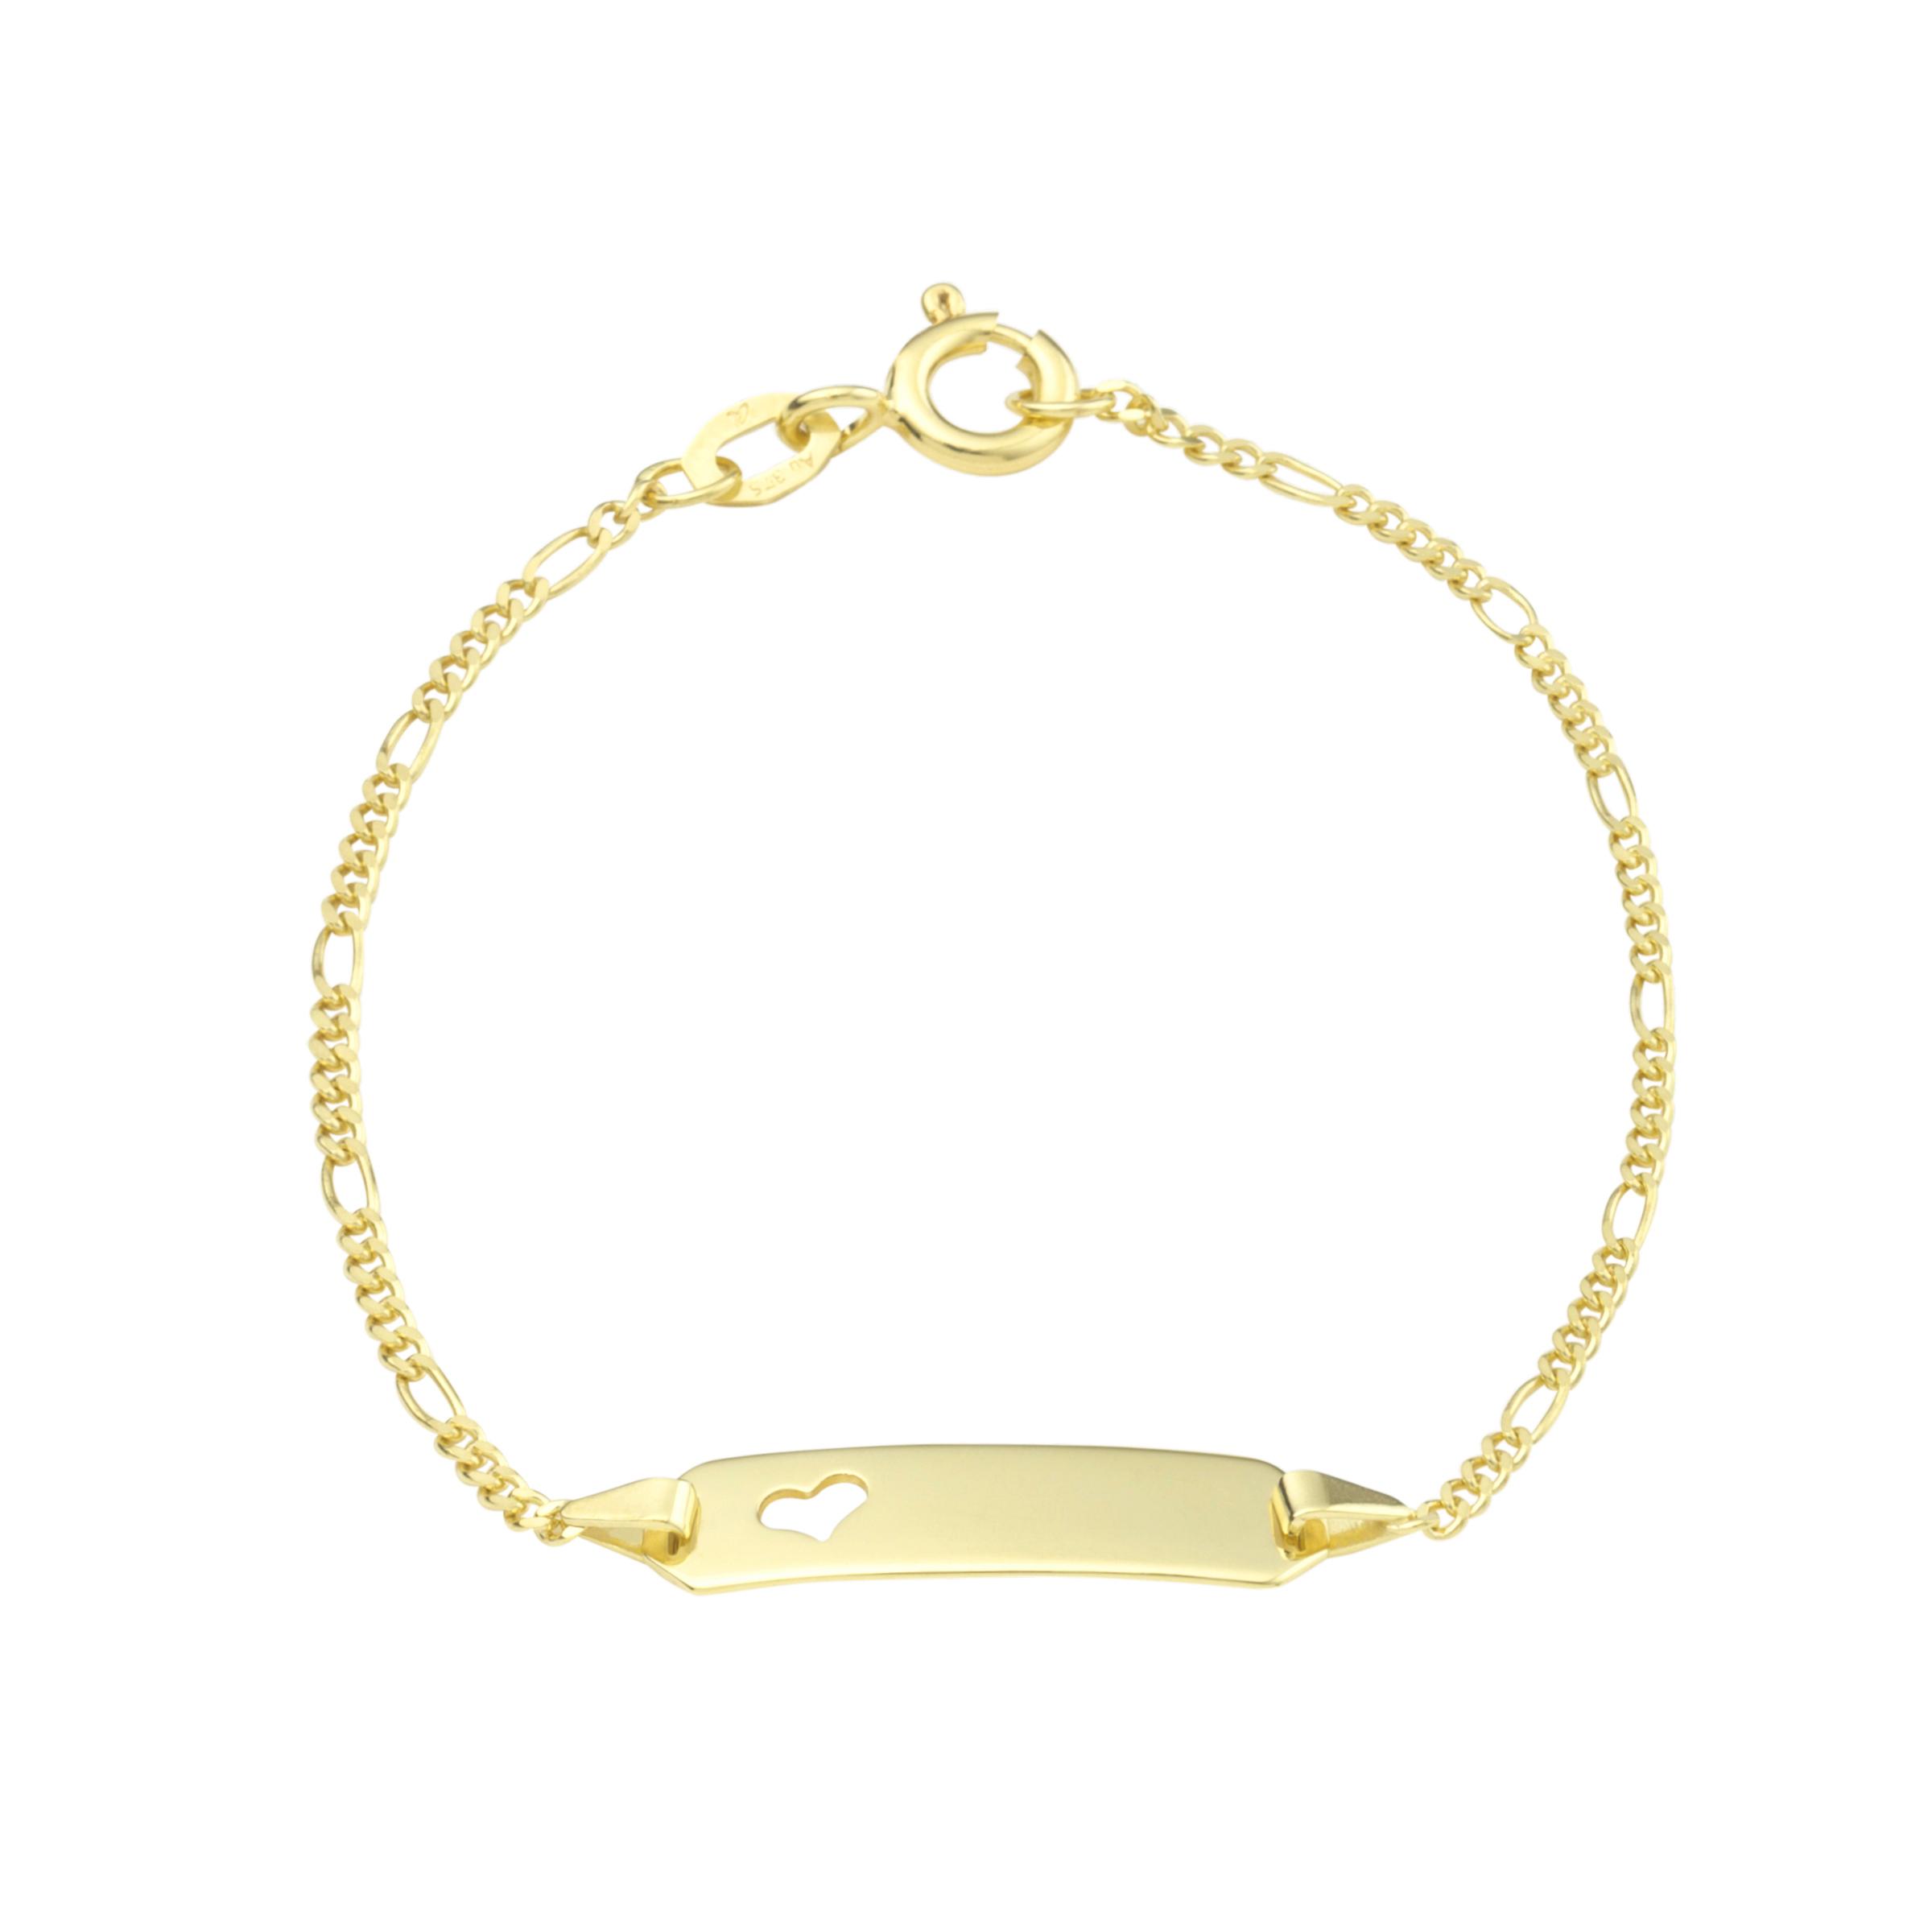 Identarmband Gold 375/9 ct Herz